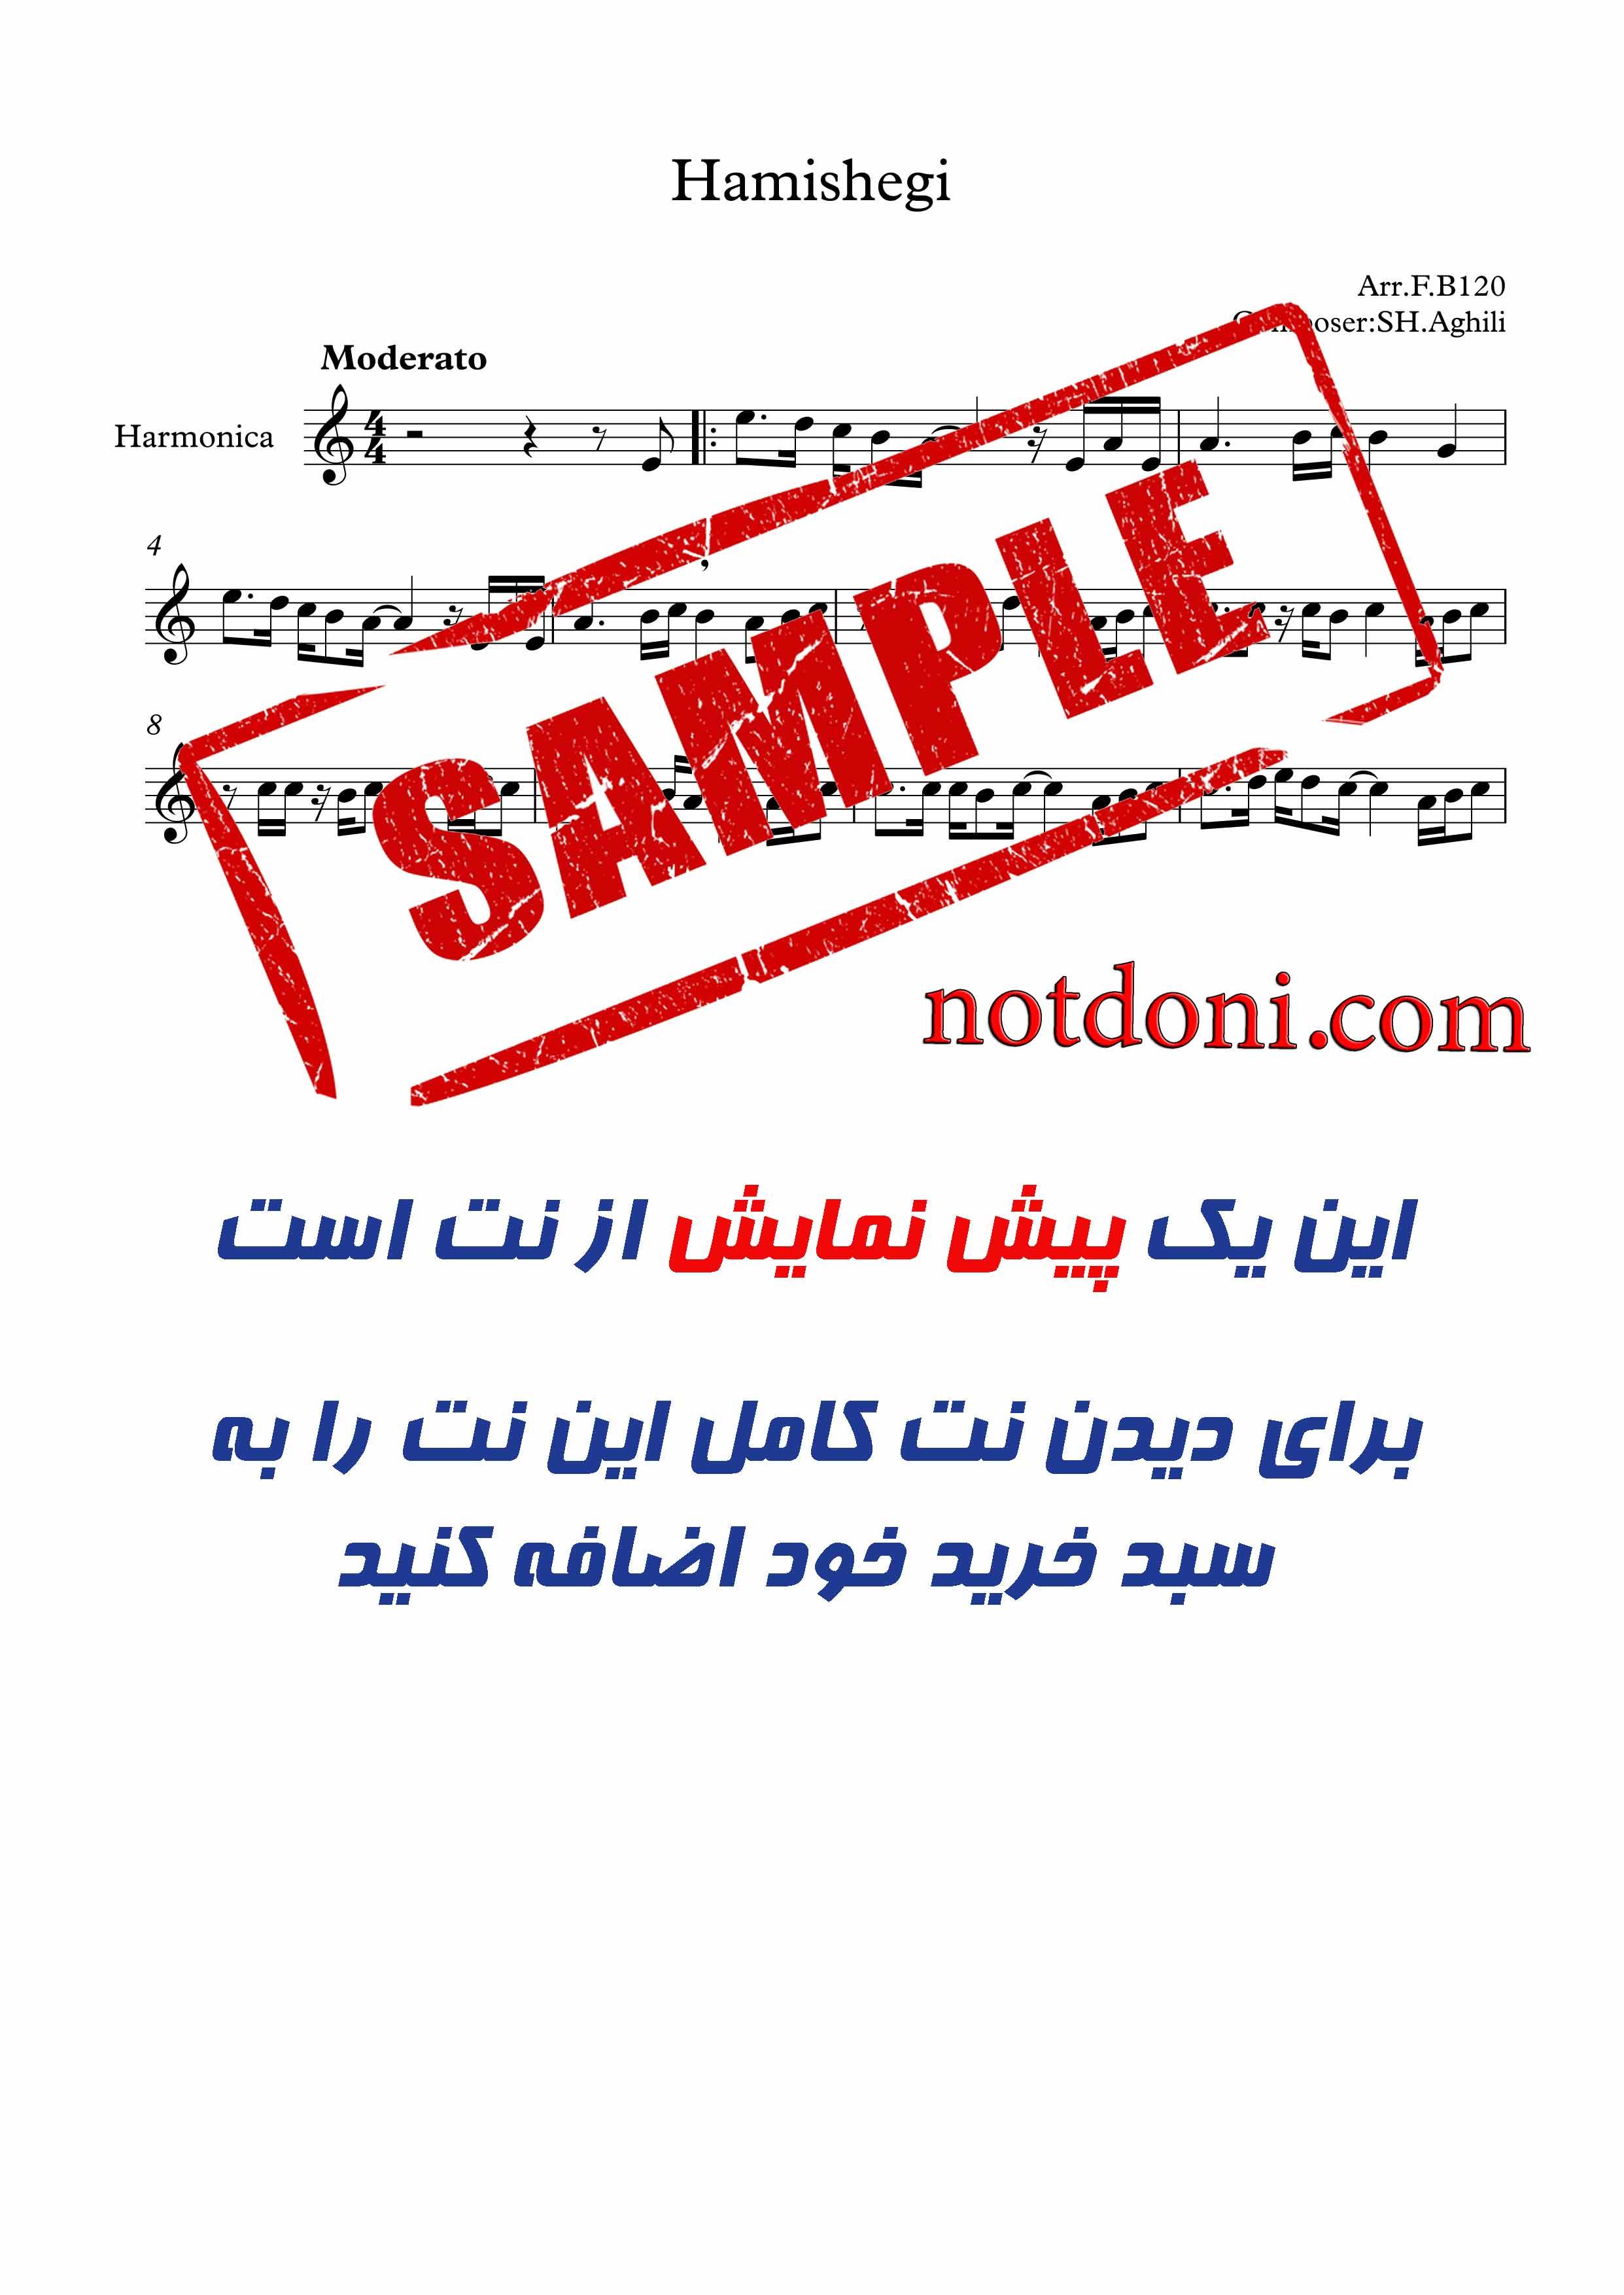 9b4b0ba2-8e64-44b5-a624-796efdb47fcd_دموی-نت-آهنگ-همیشگی-هارمونیکا.jpg